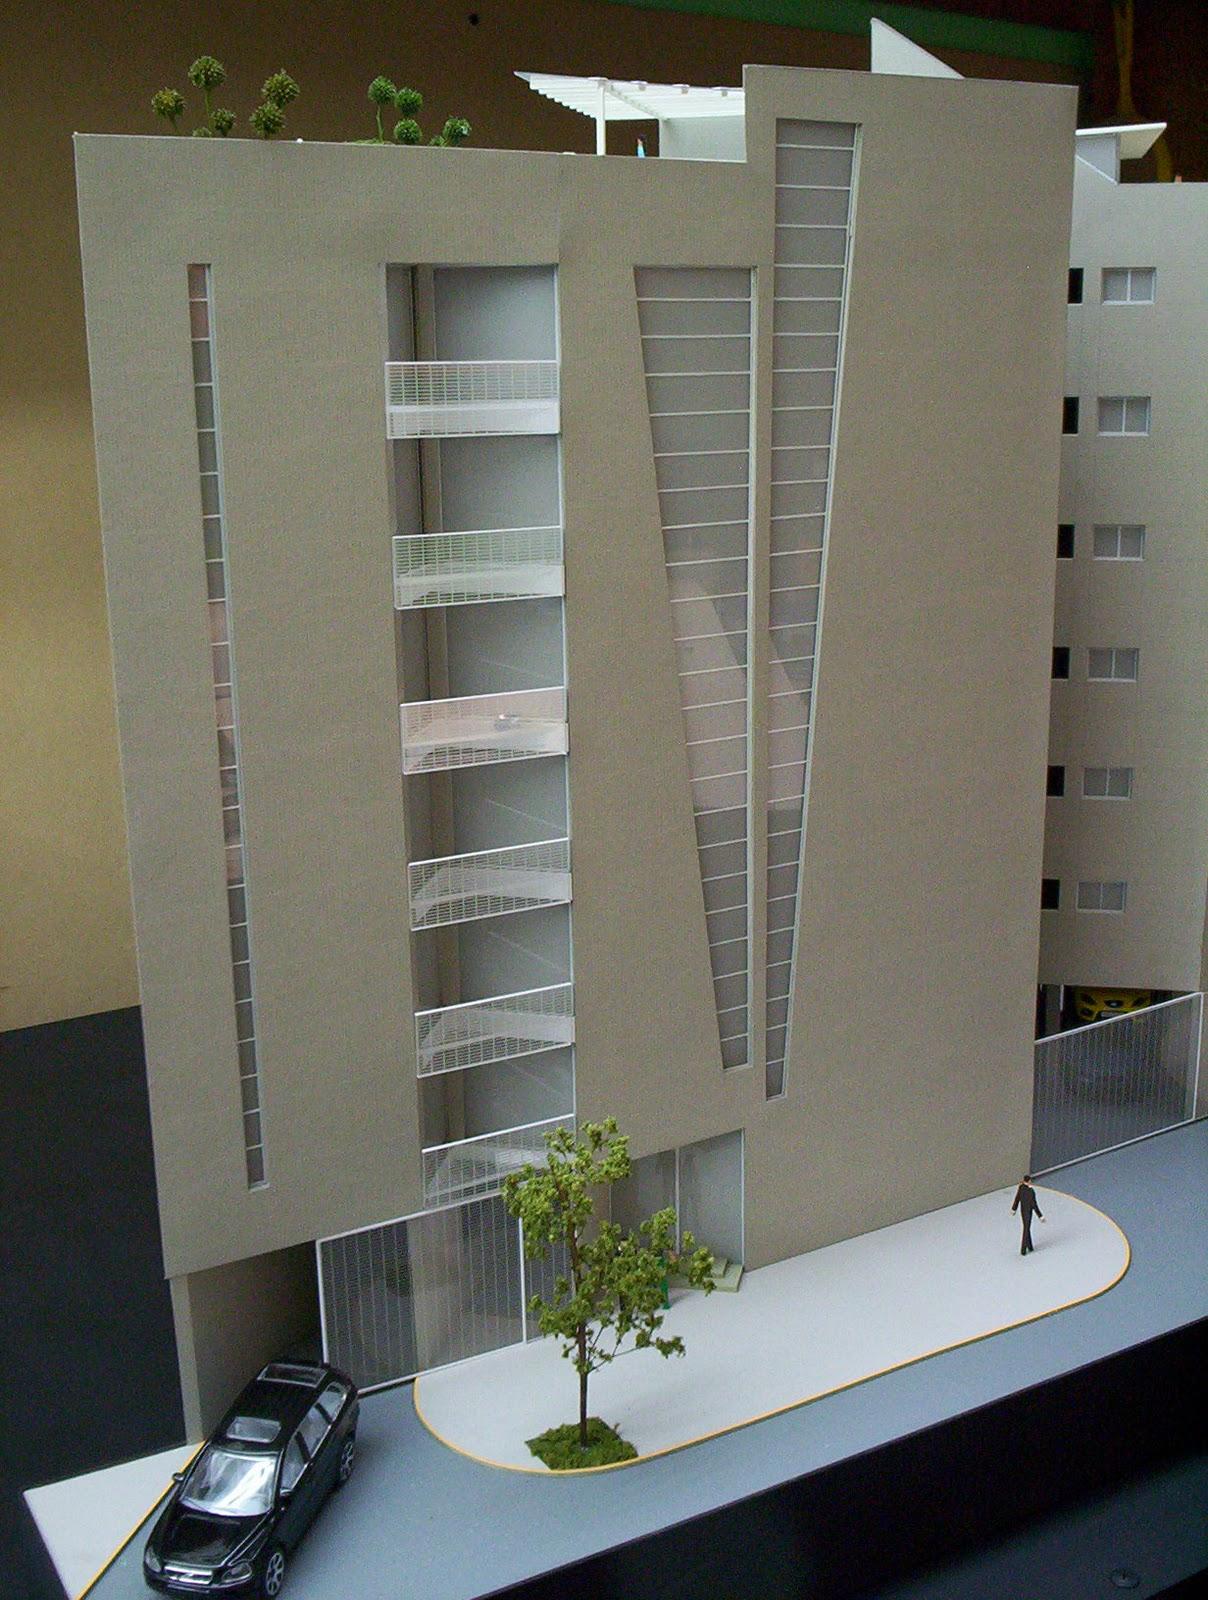 Edificio de departamentos for Edificio de departamentos planos